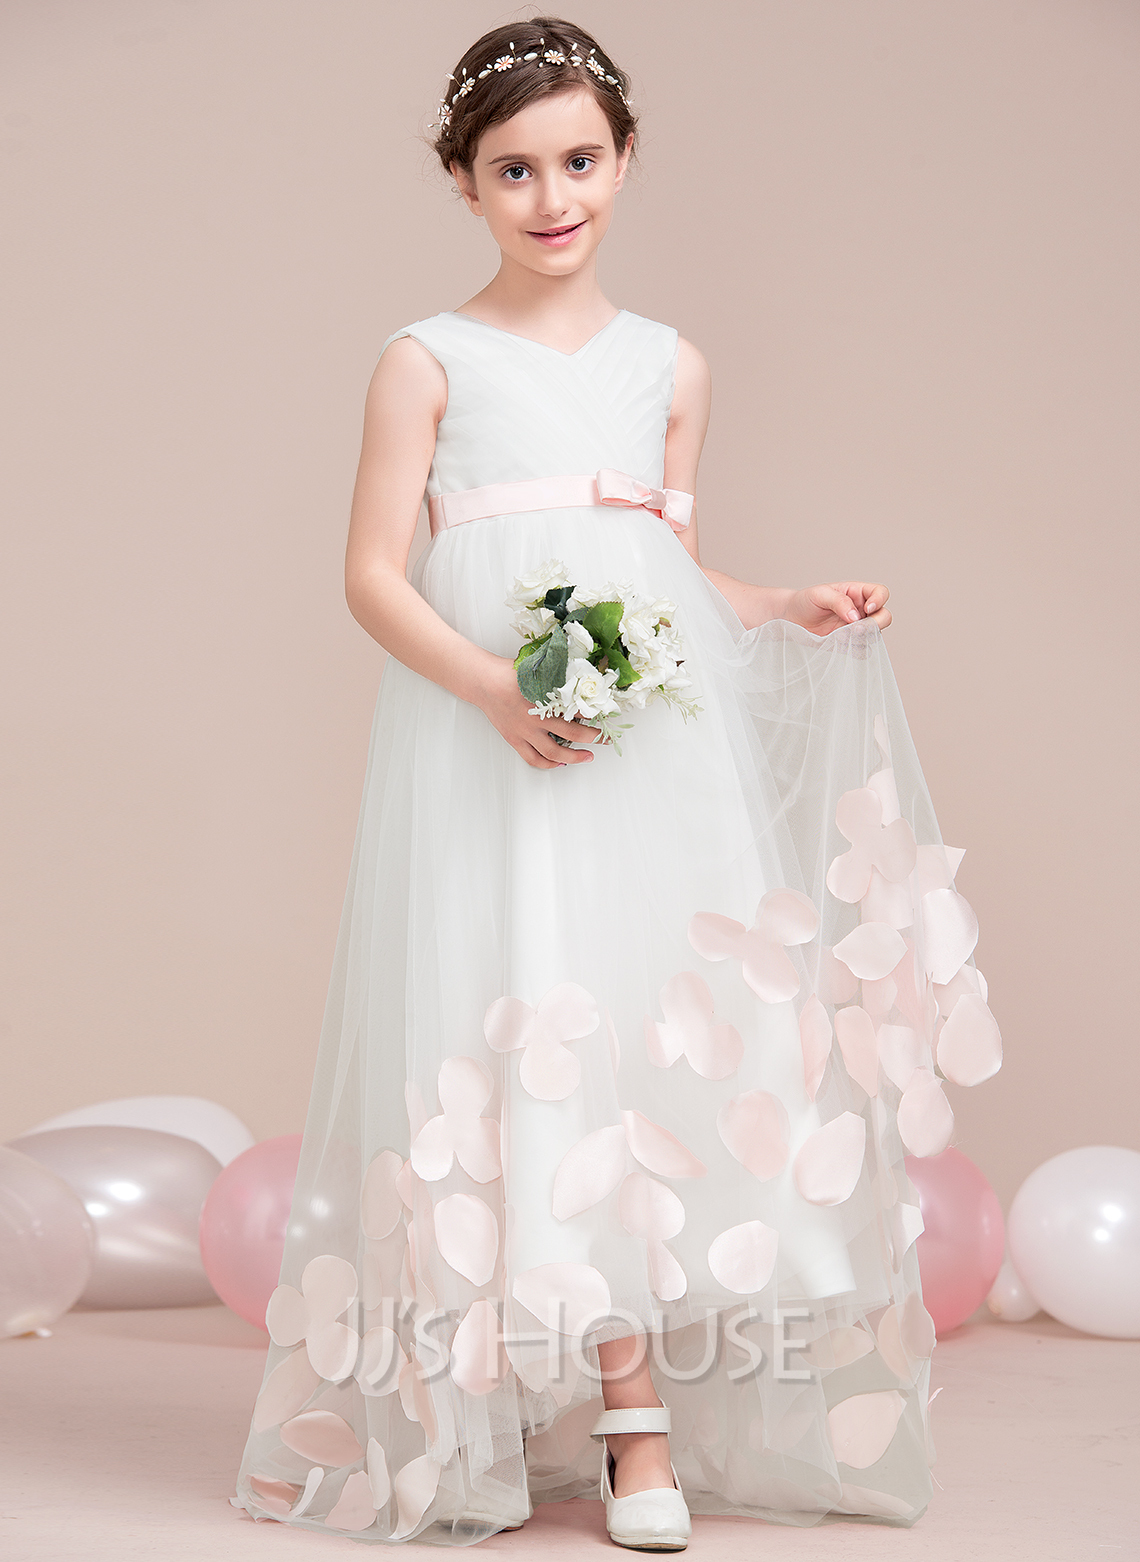 A-Line V-neck Asymmetrical Tulle Junior Bridesmaid Dress With Sash Flower(s) Bow(s)